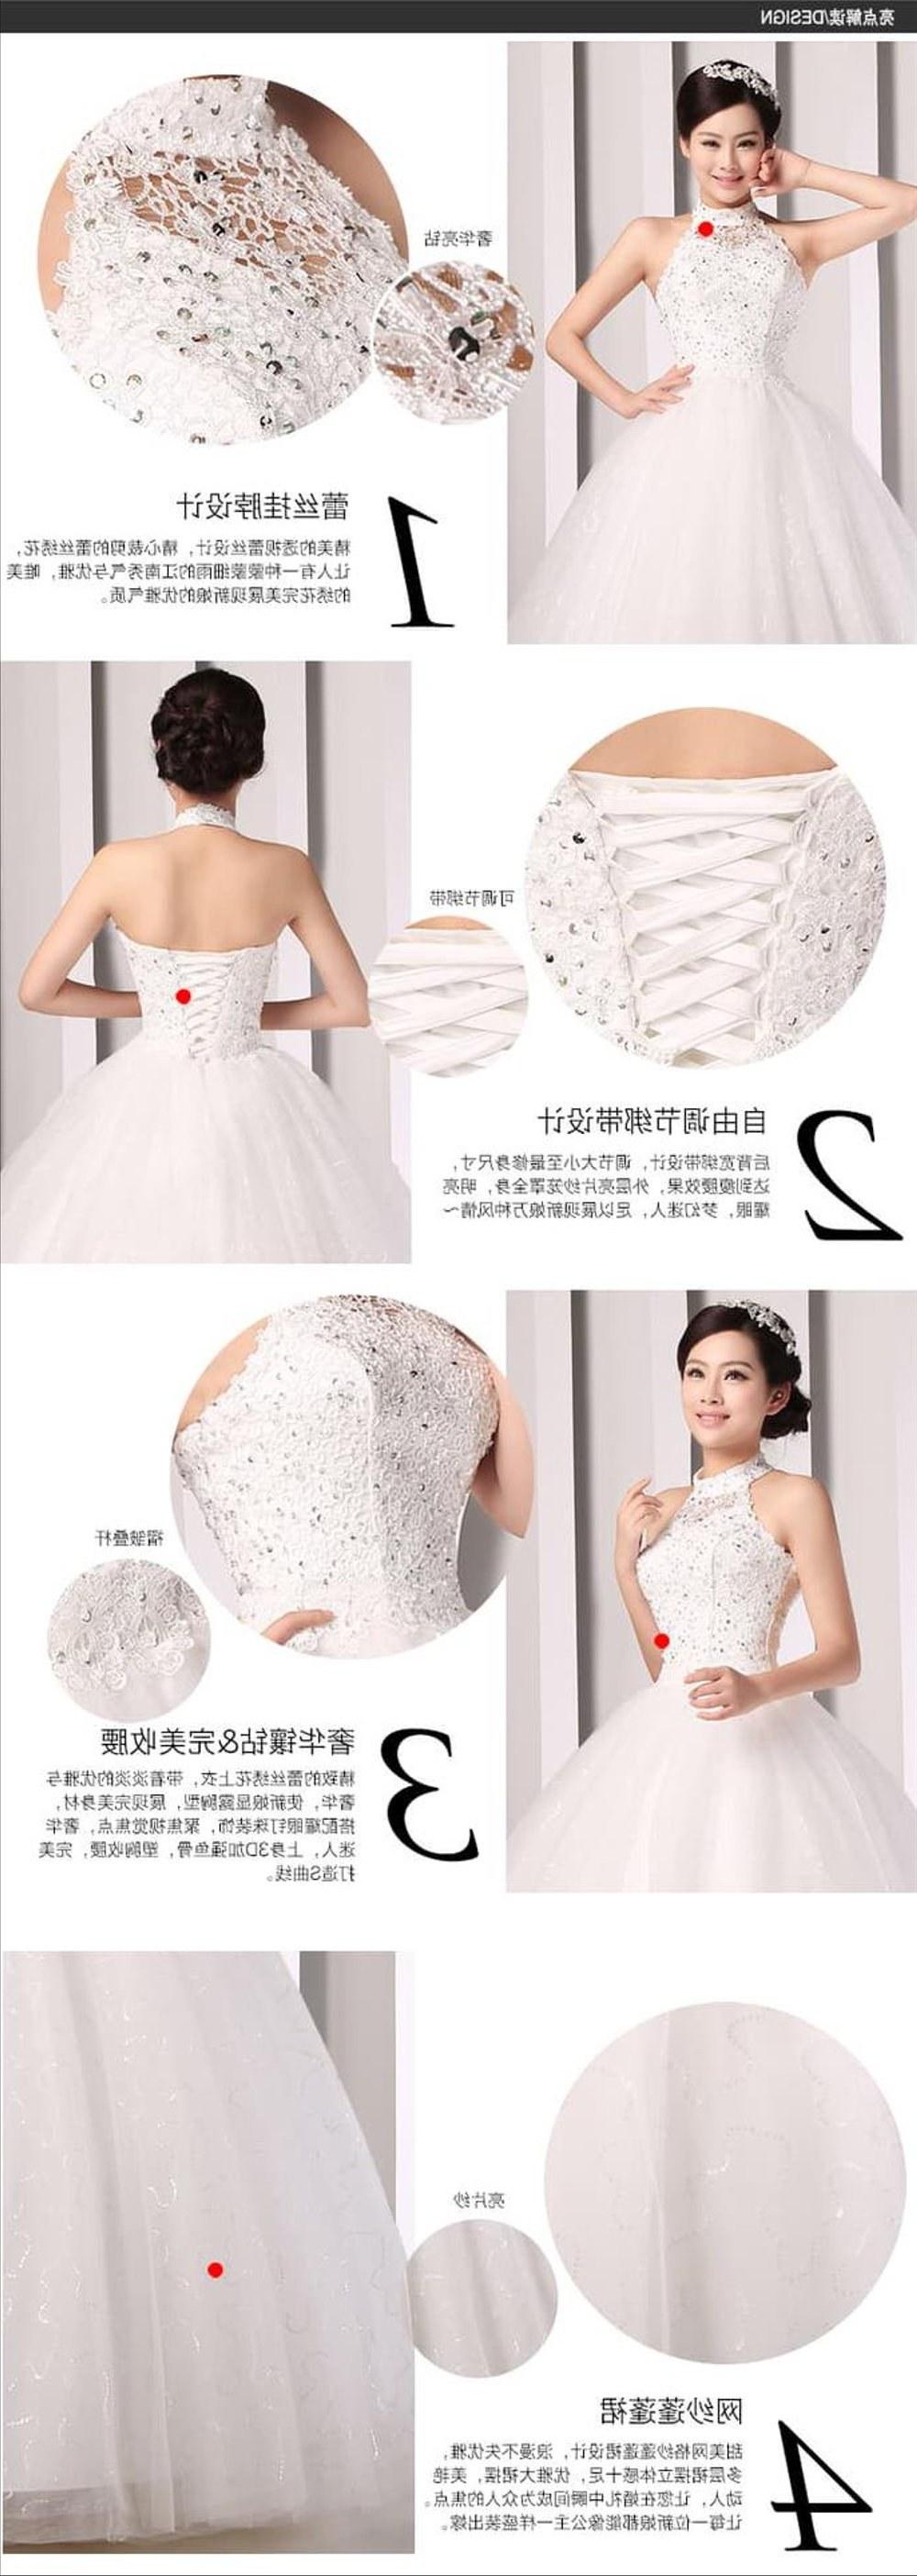 Model Gaun Pengantin Muslimah 2016 Dddy Wedding Dress Gaun Pengantin Ikat Leher Payet Bordir Korea 2016